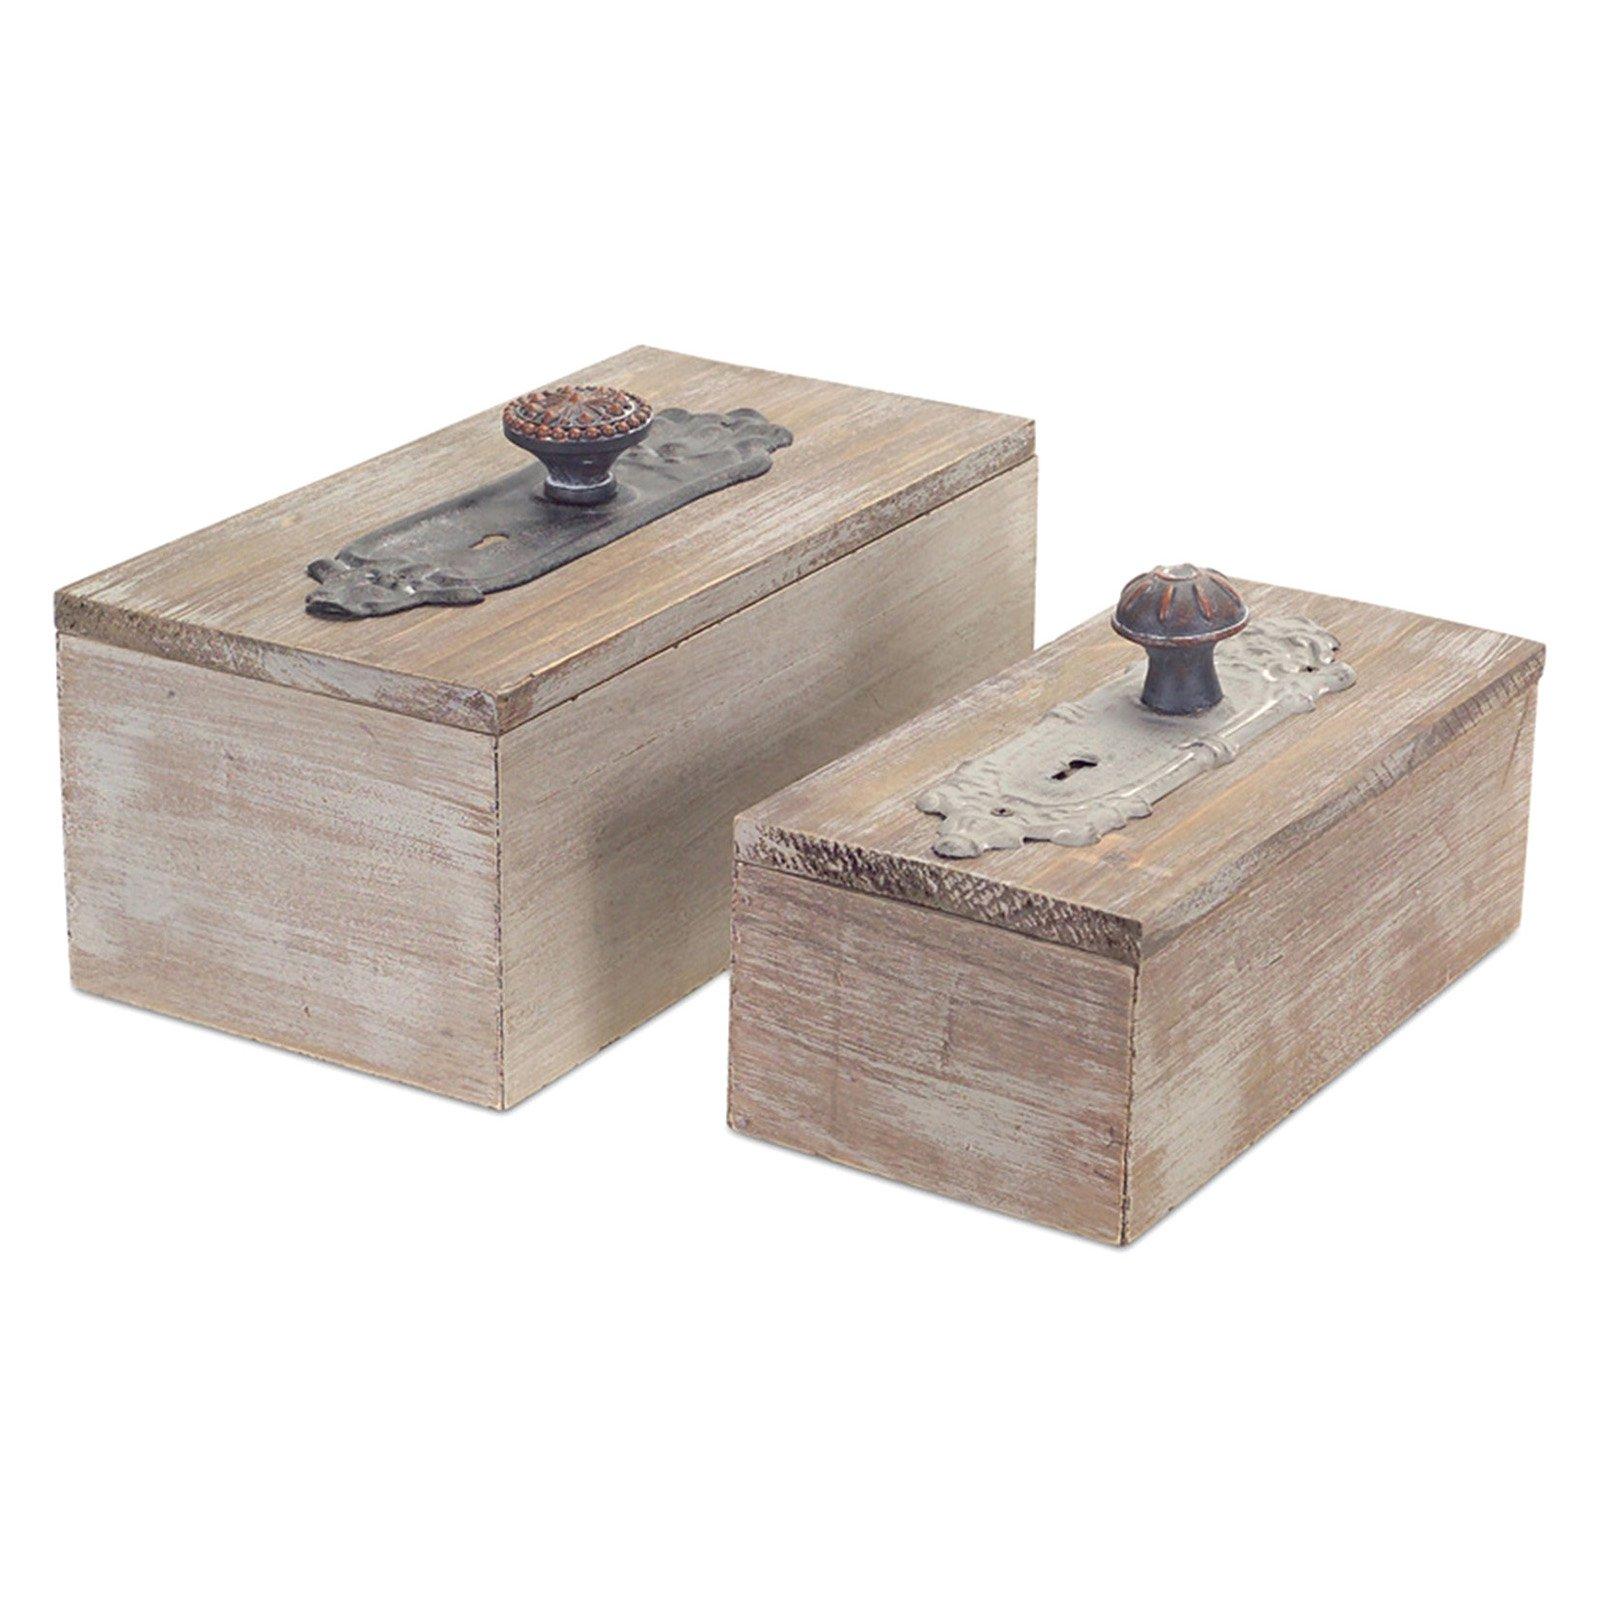 Melrose International Door Knob Box - Set of 2